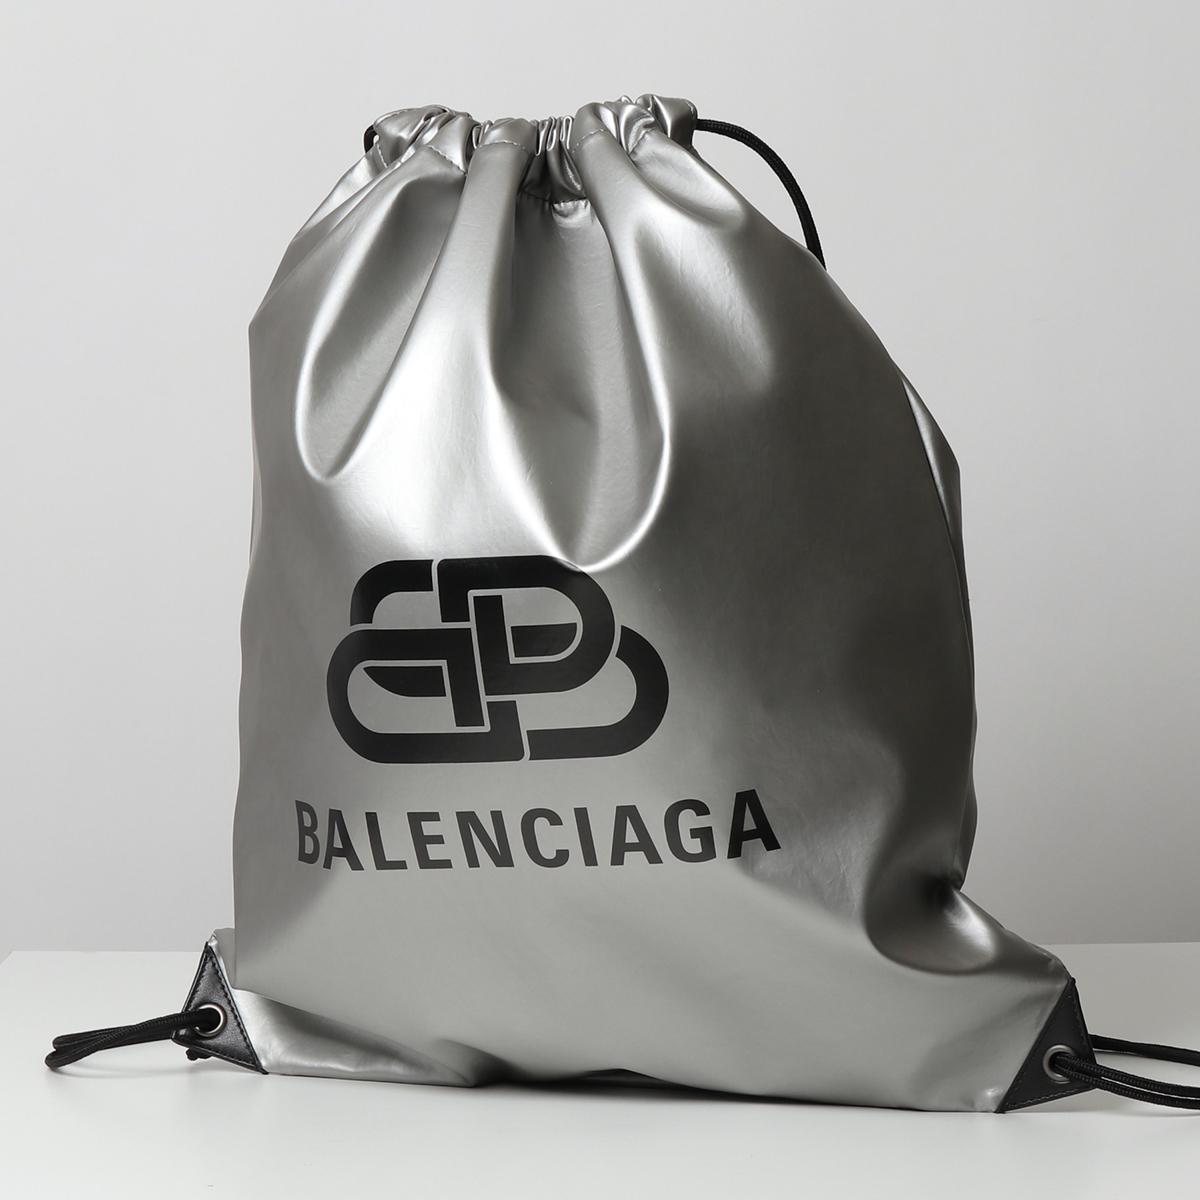 BALENCIAGA バレンシアガ 593648 HR515 BB ロゴプリント バックパック リュック ナップサック 鞄 8110/SILVER メンズ